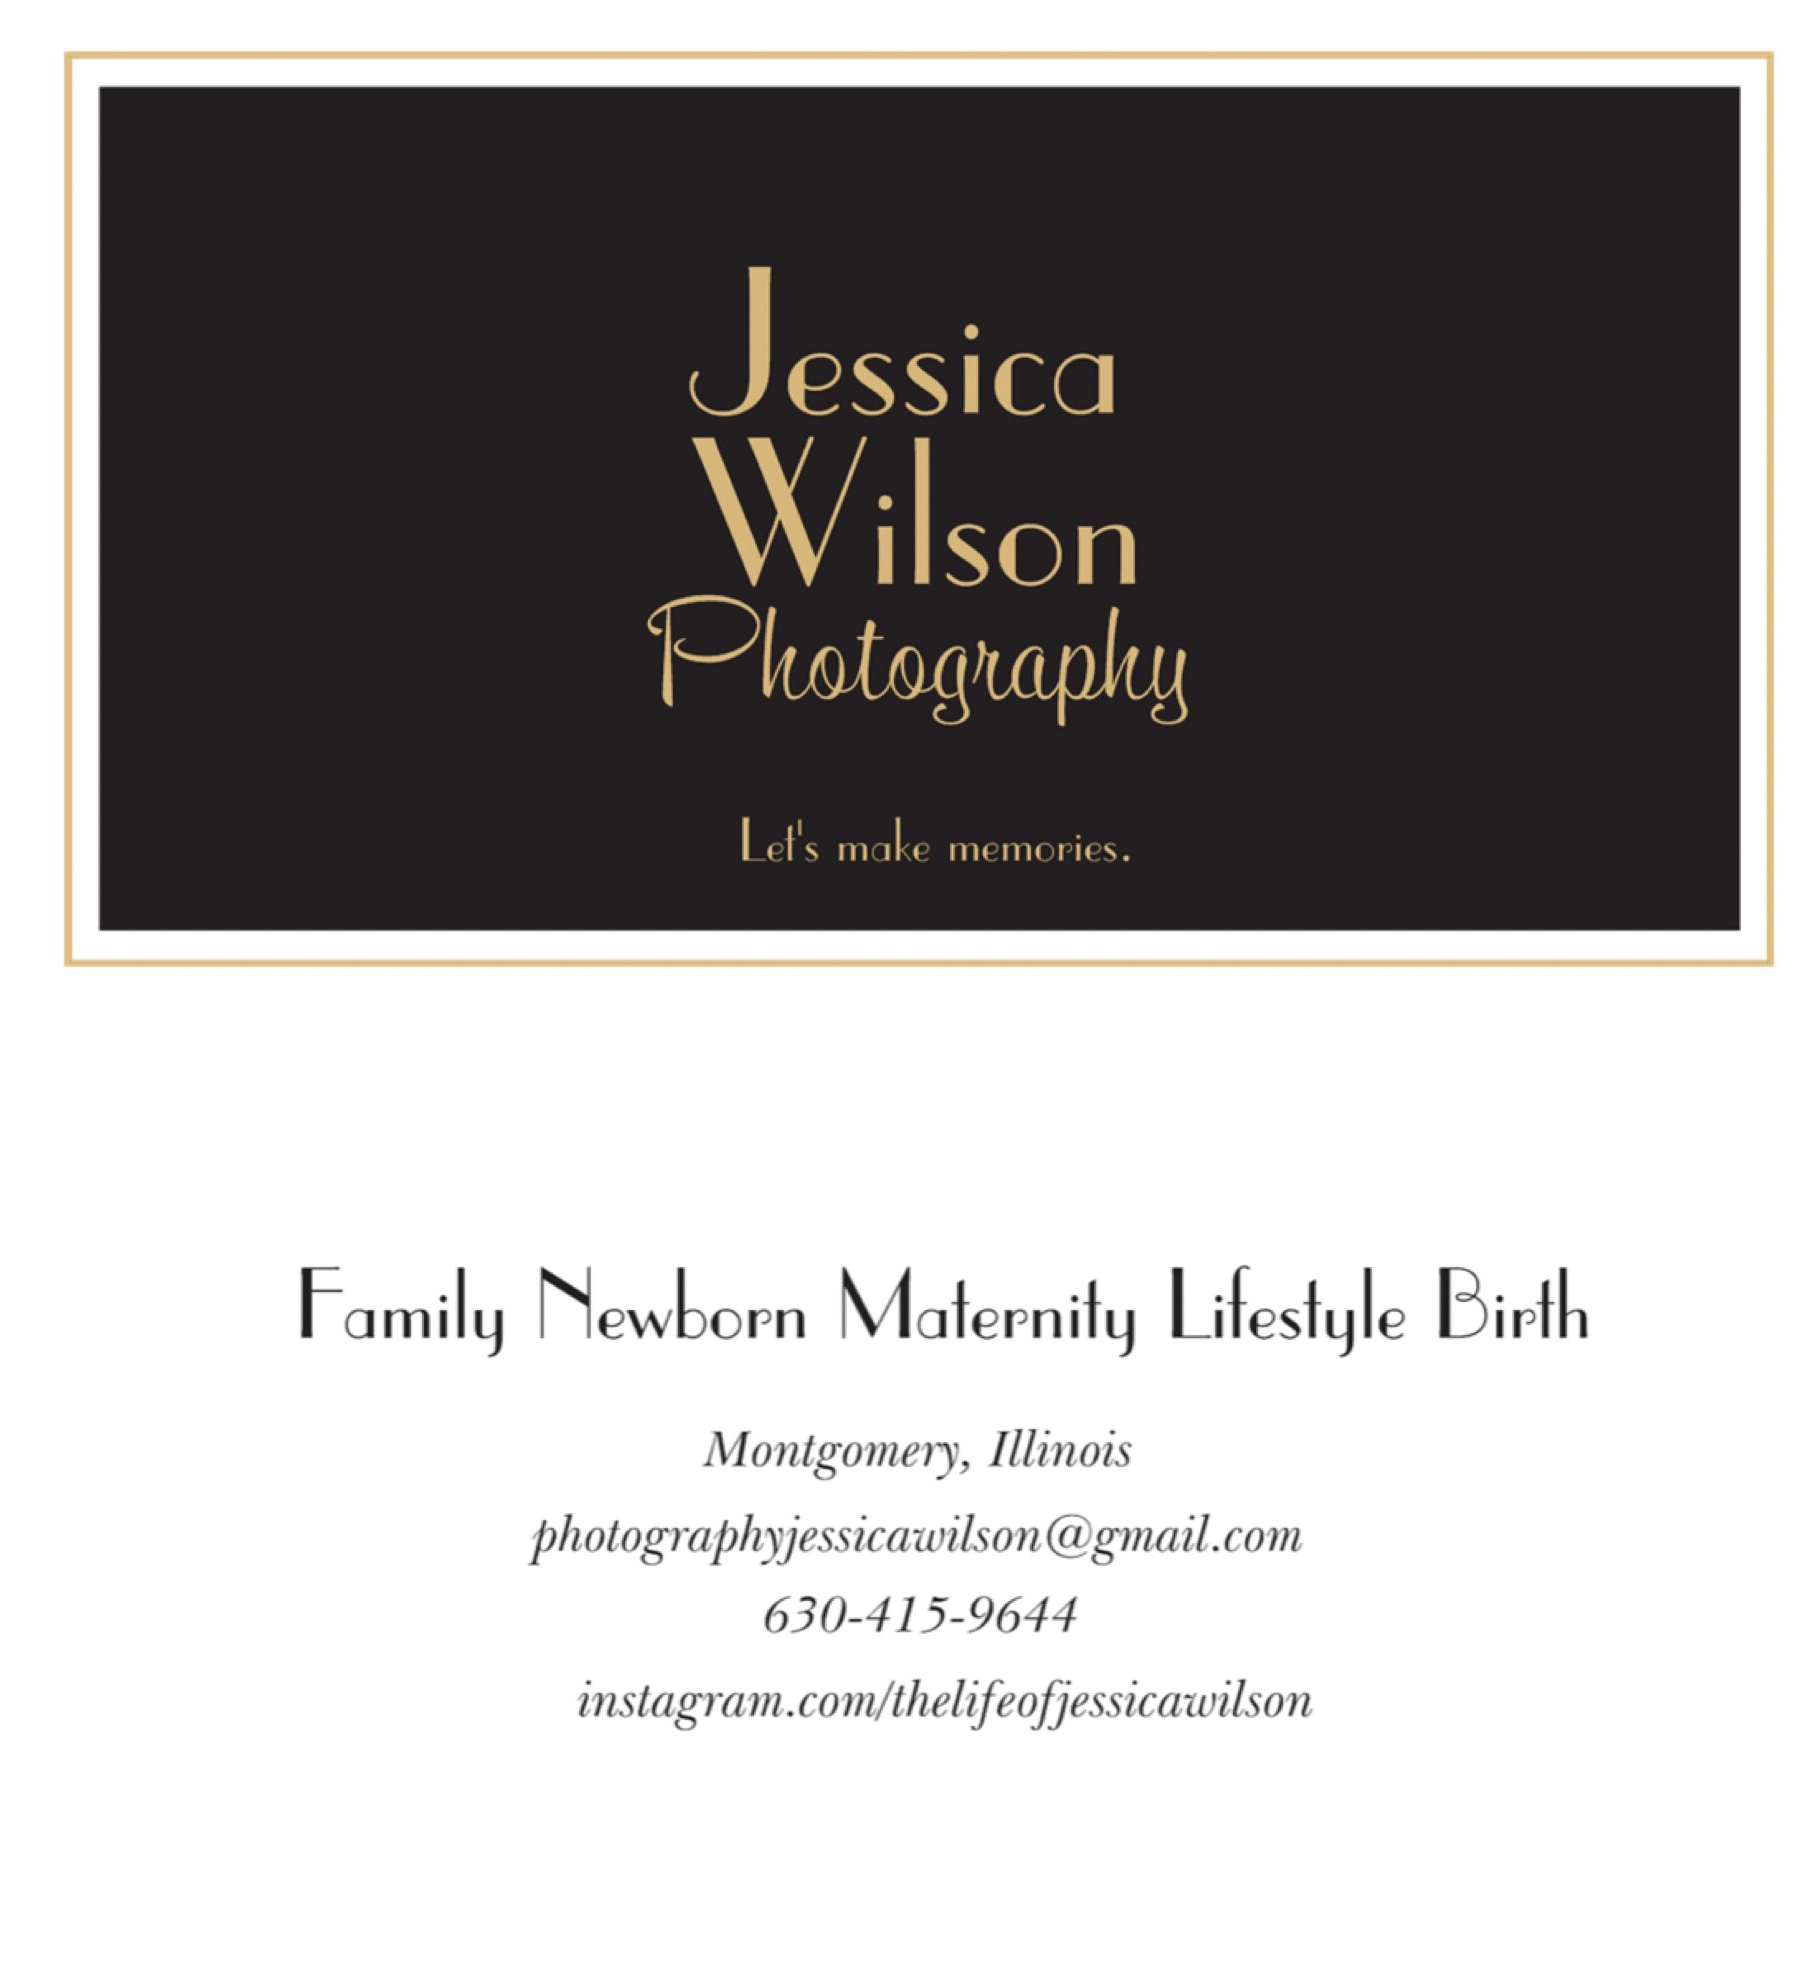 Jessica Wilson Photography